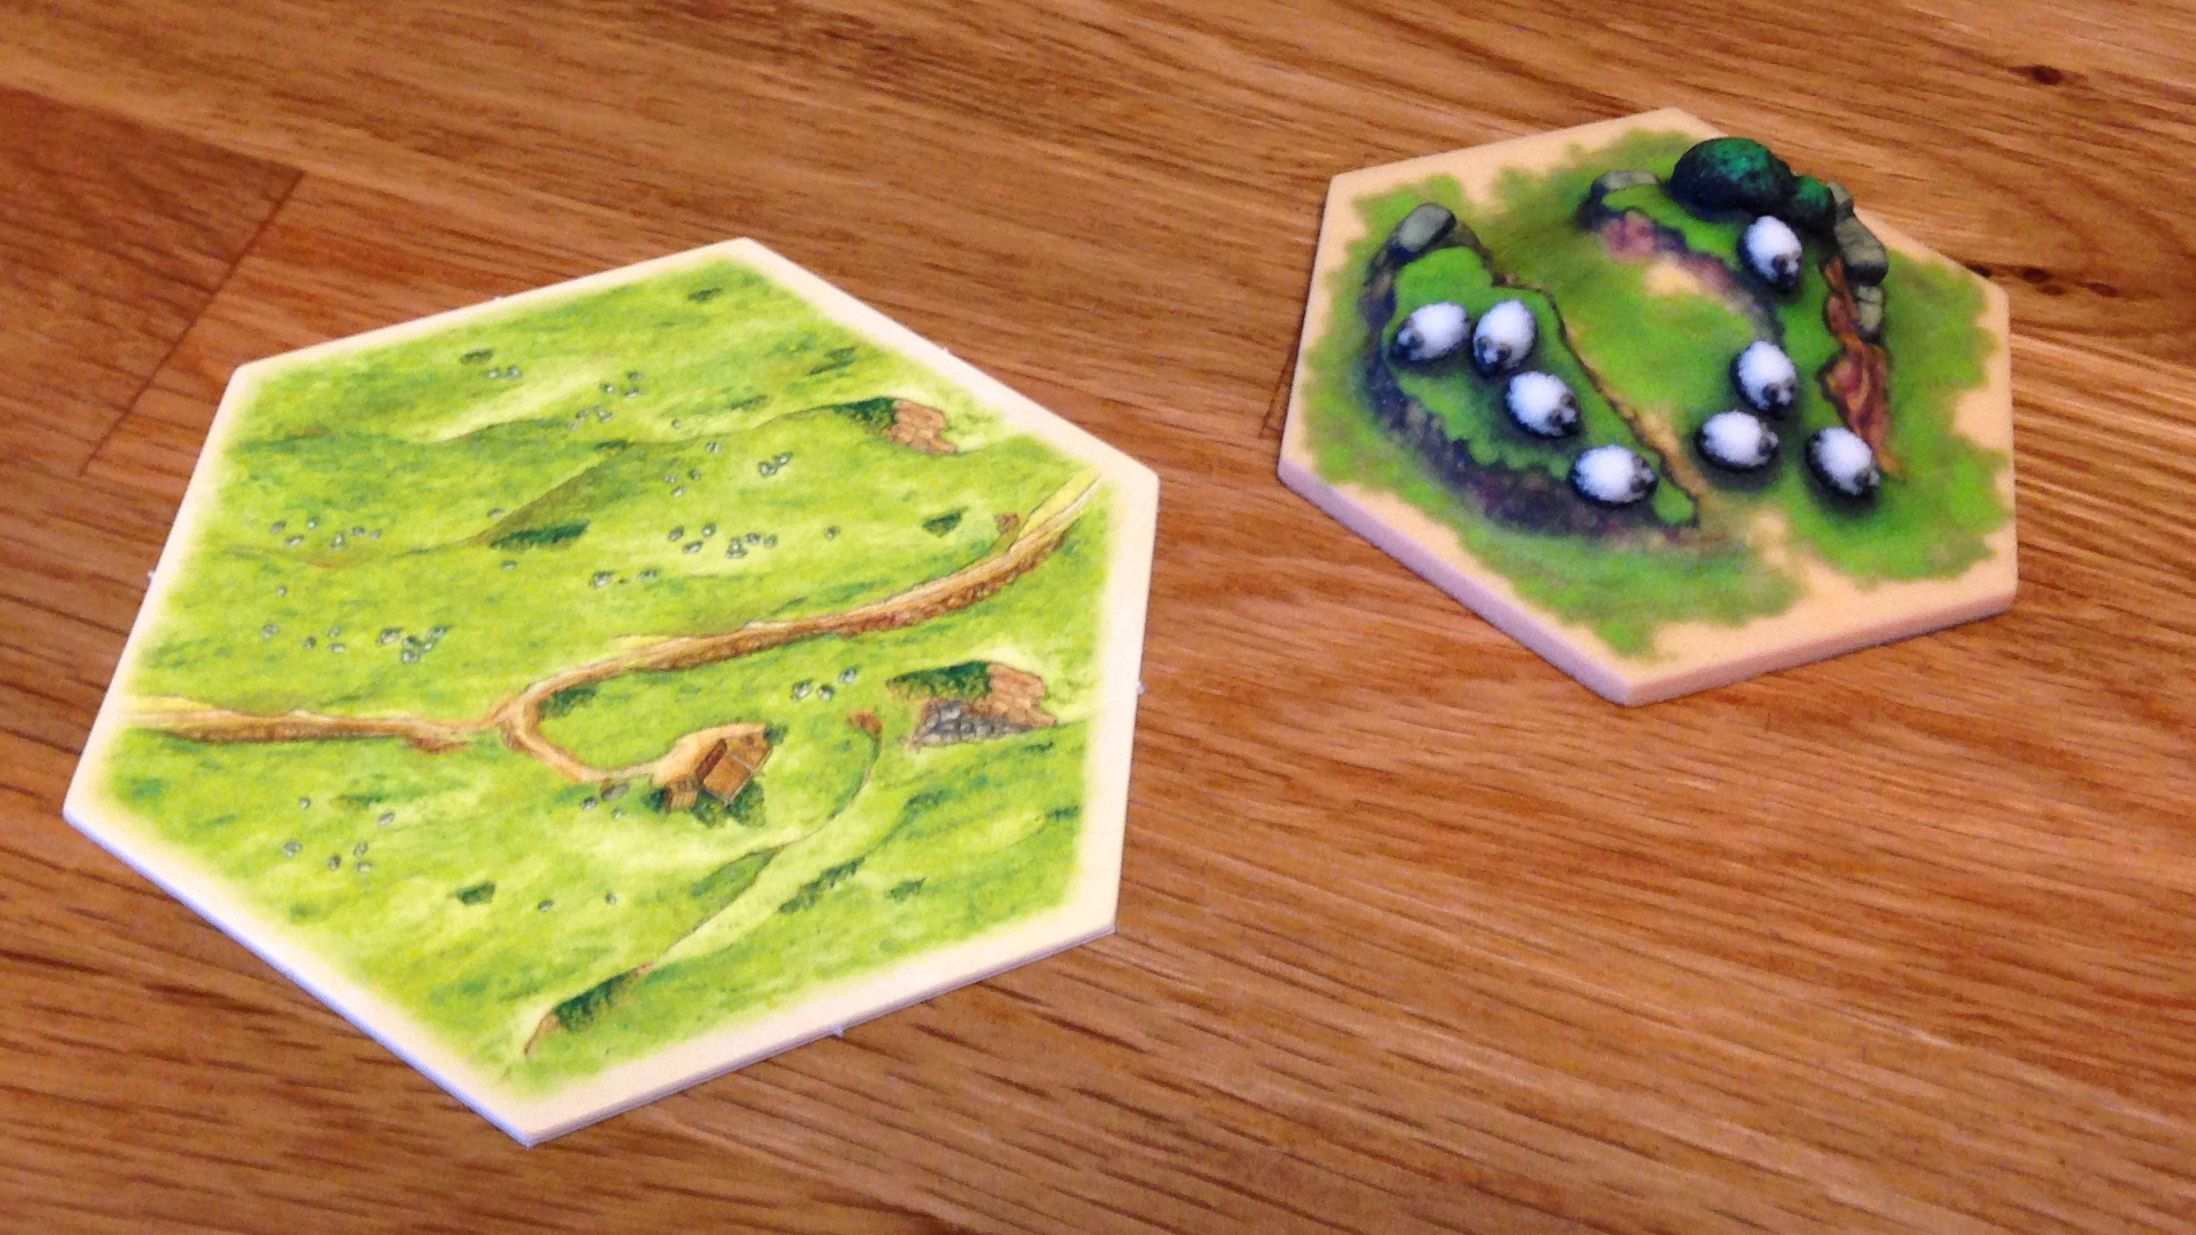 board-game-setters-of-catan-3D-printed-tile-014.jpg